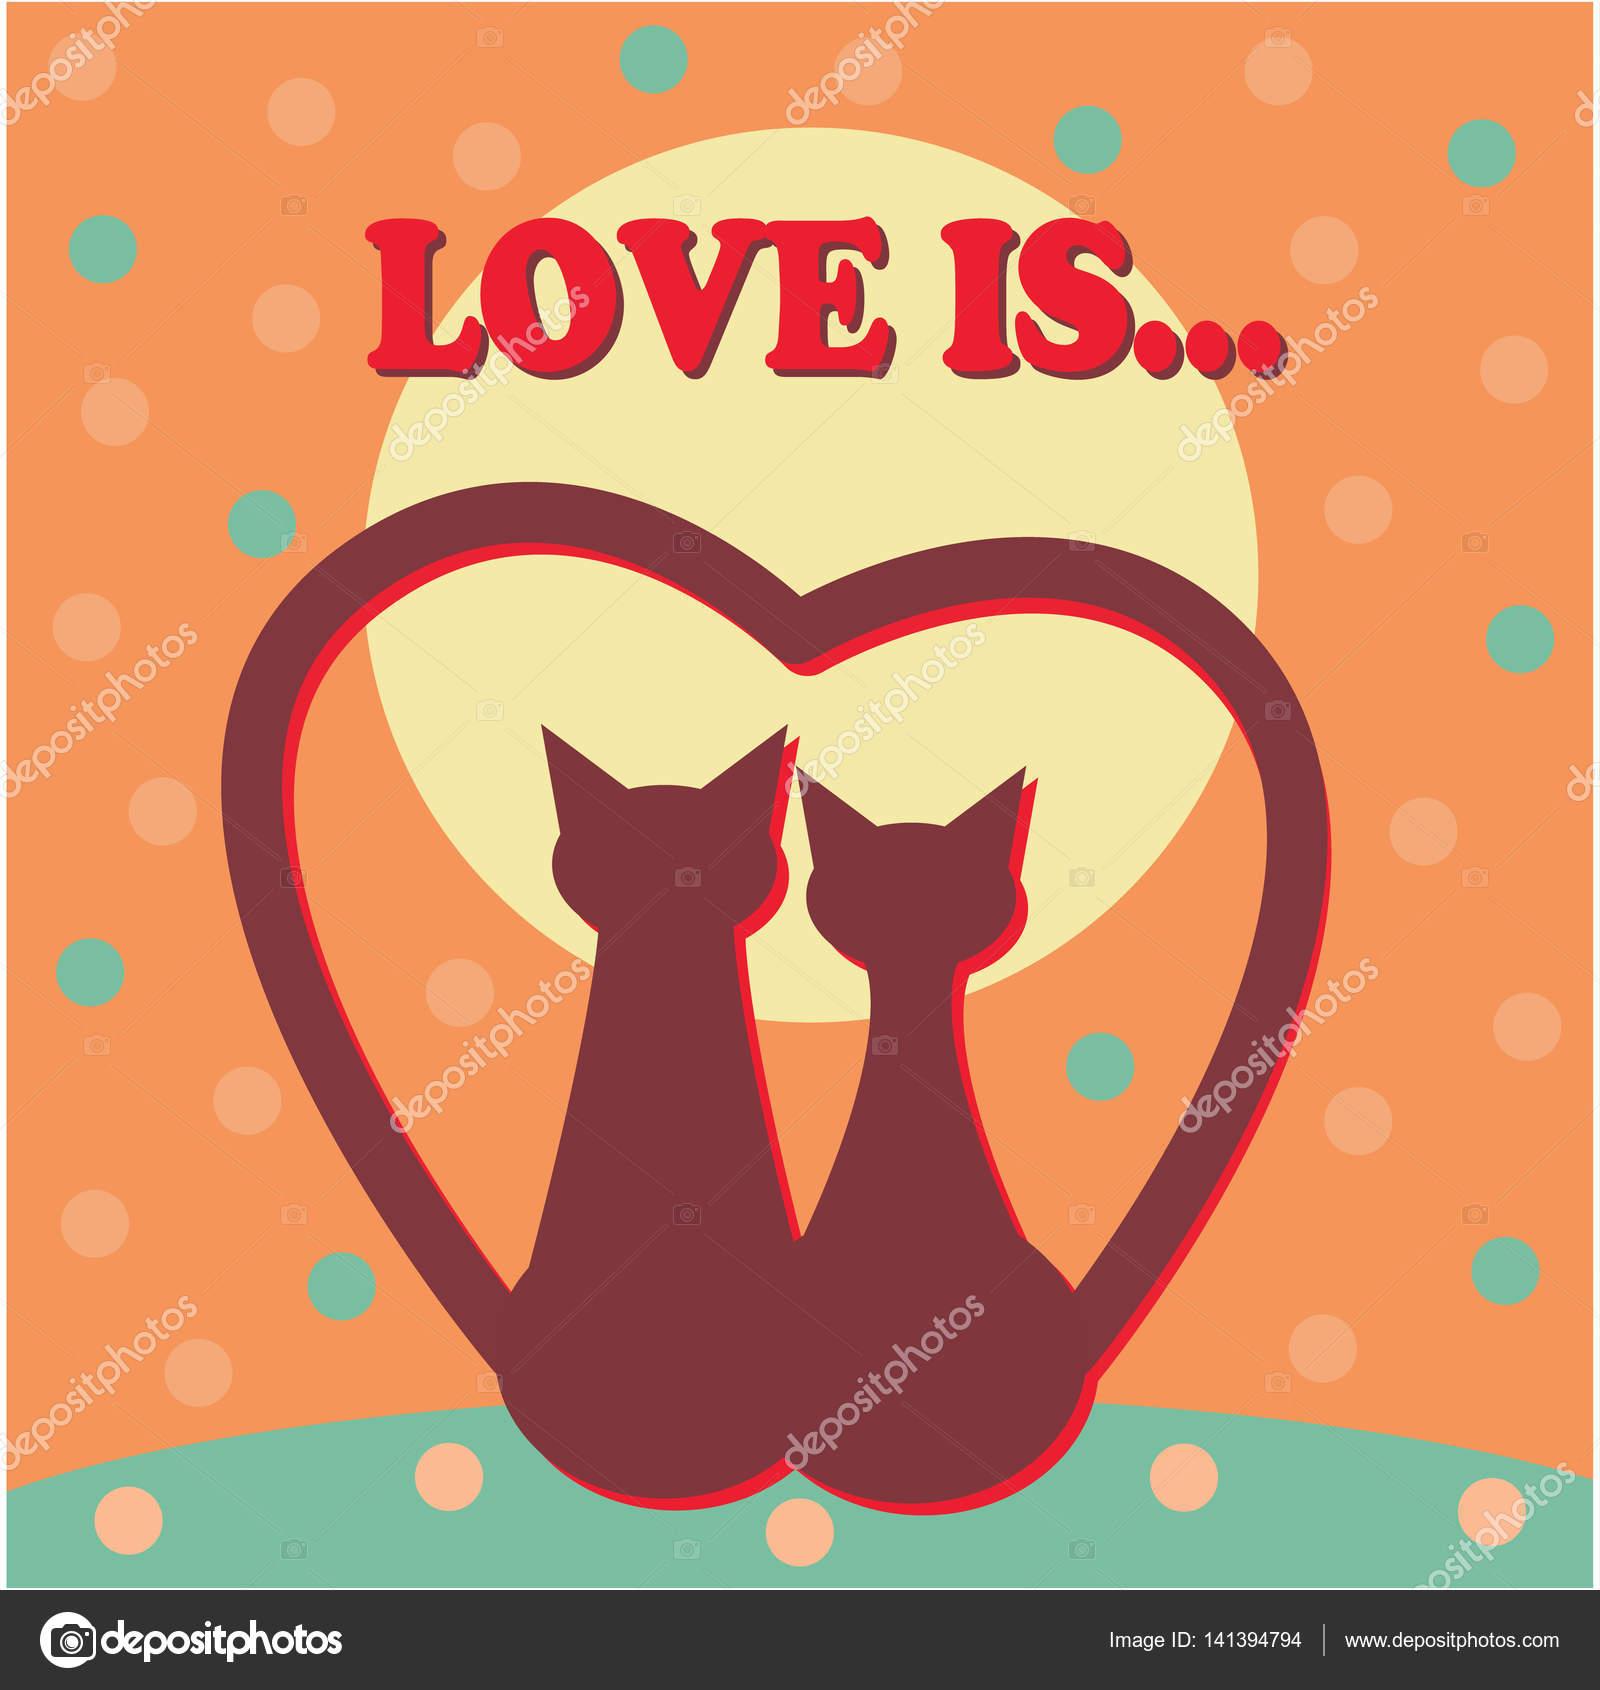 Valentinstag Karten Vorlage Vektor — Stockvektor © VectorShow #141394794